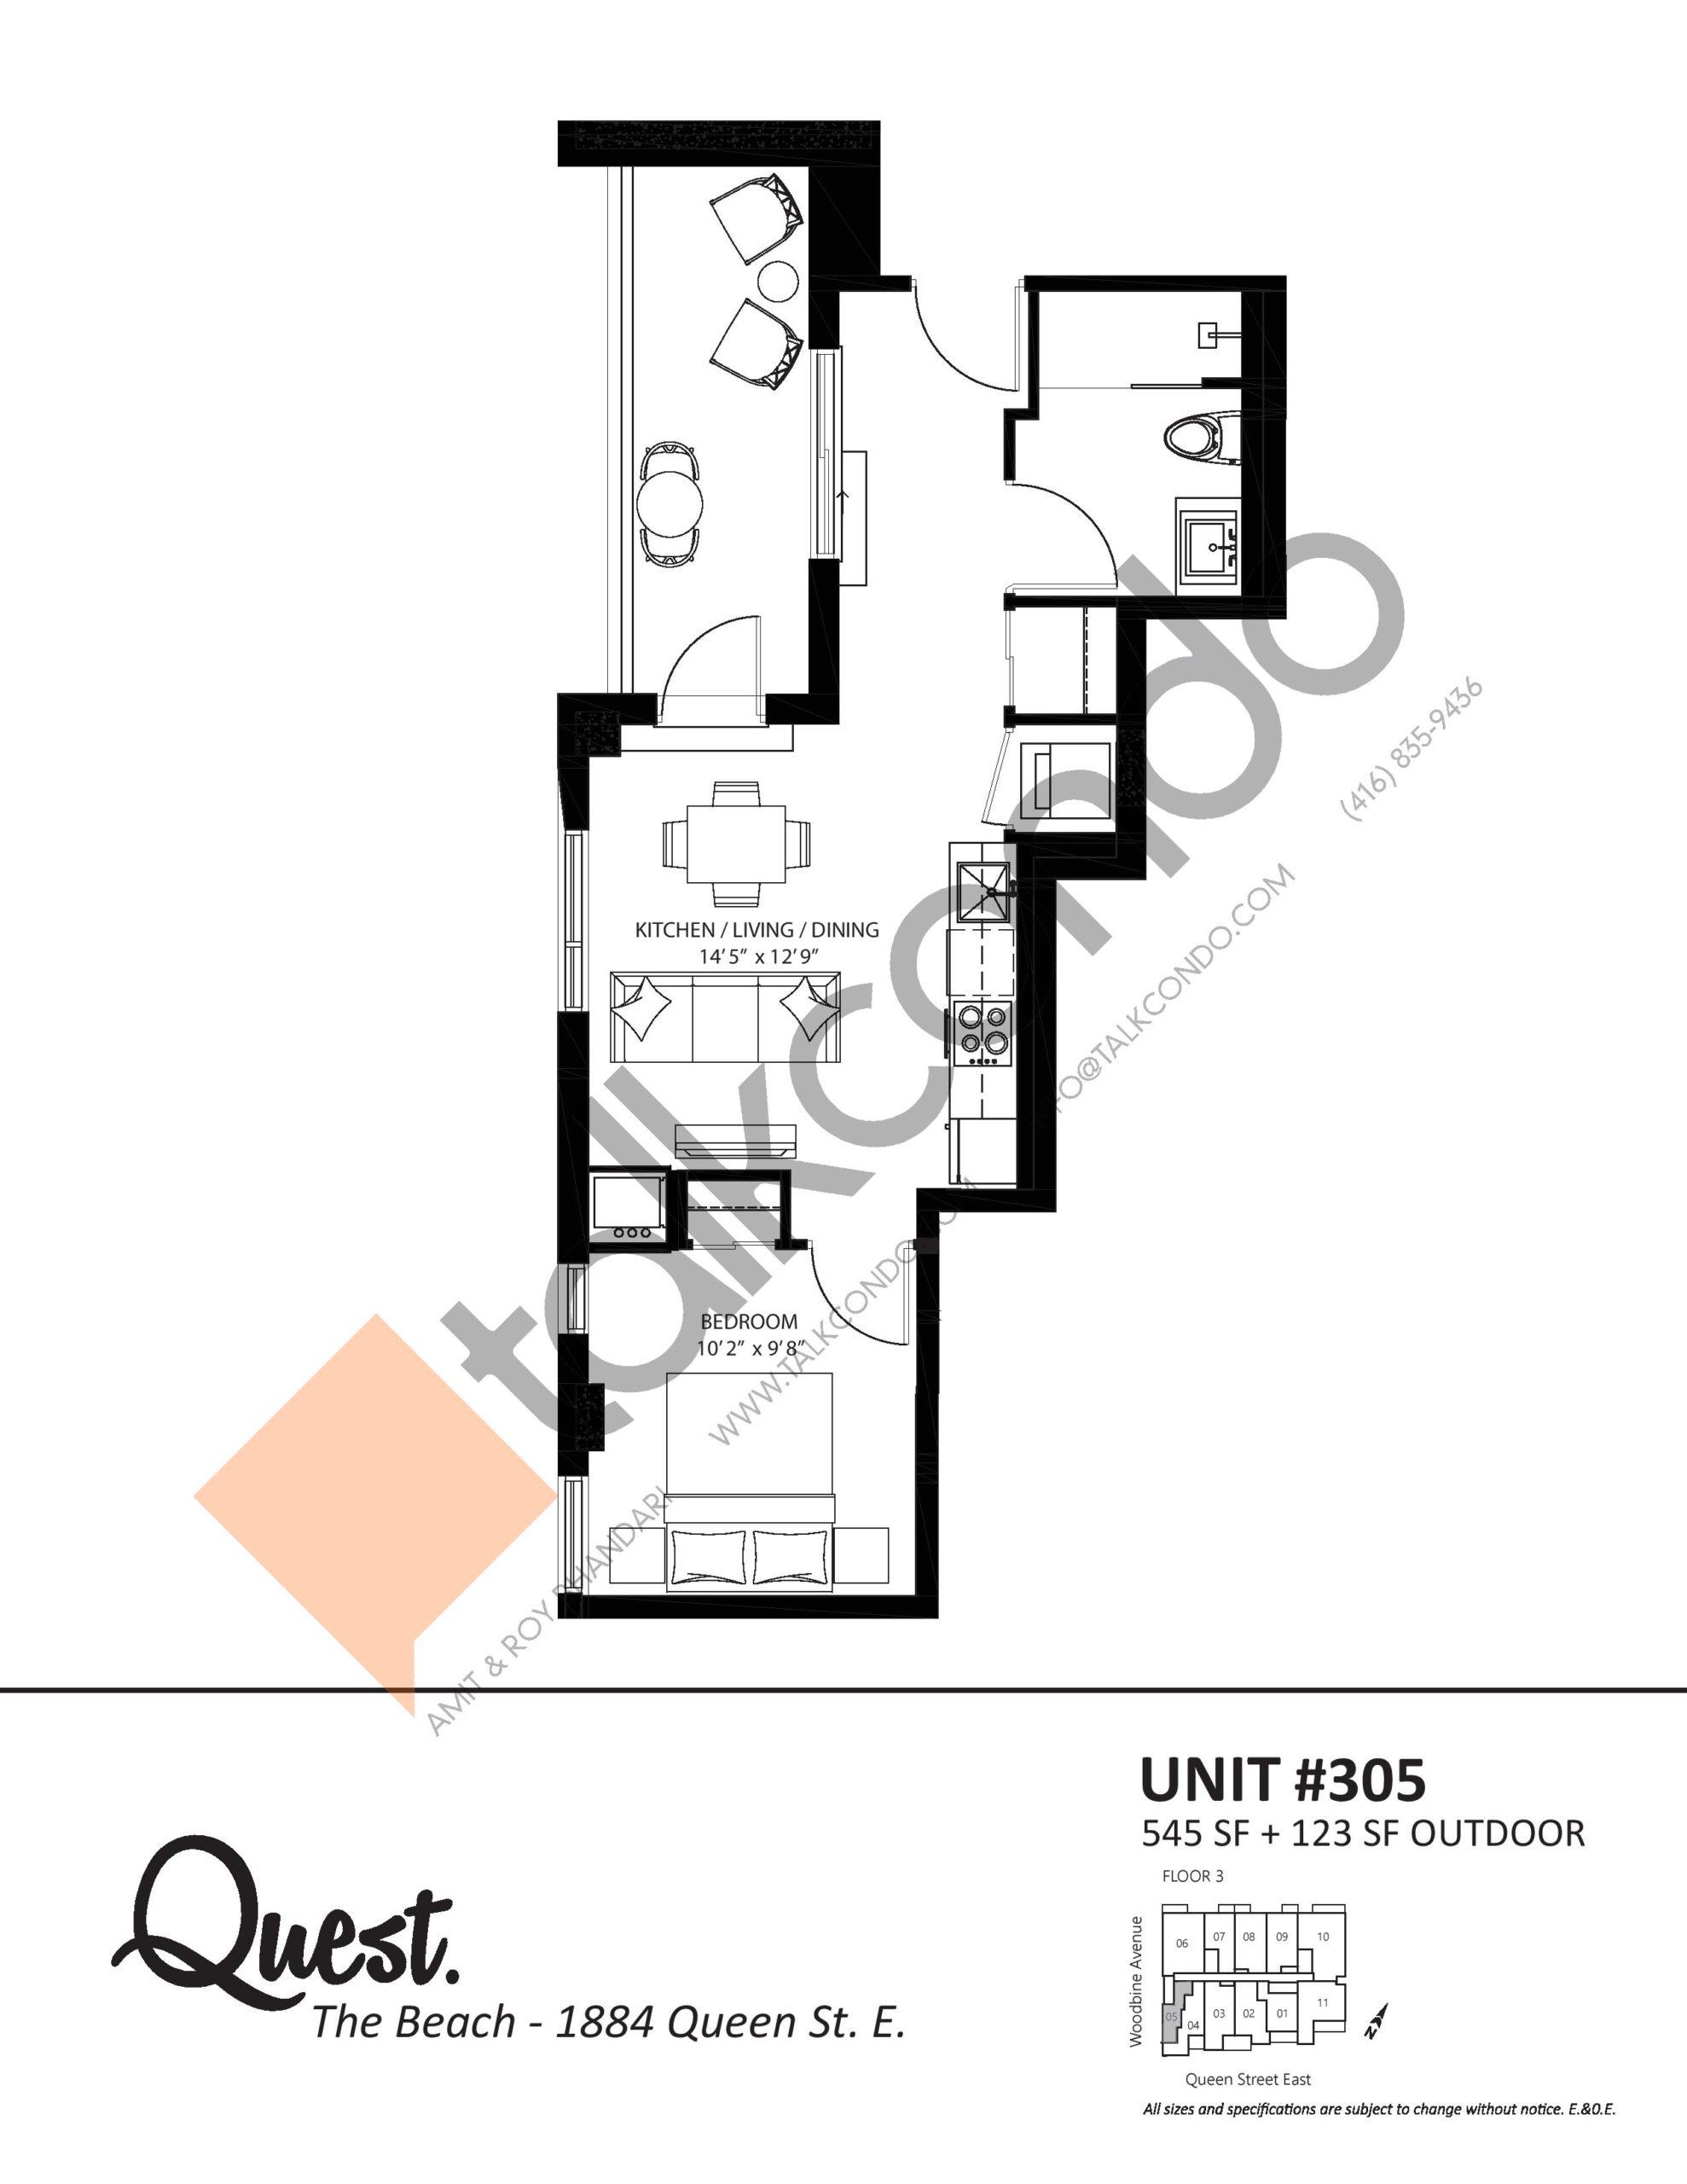 Unit 305 Floor Plan at Heartwood the Beach Condos - 545 sq.ft